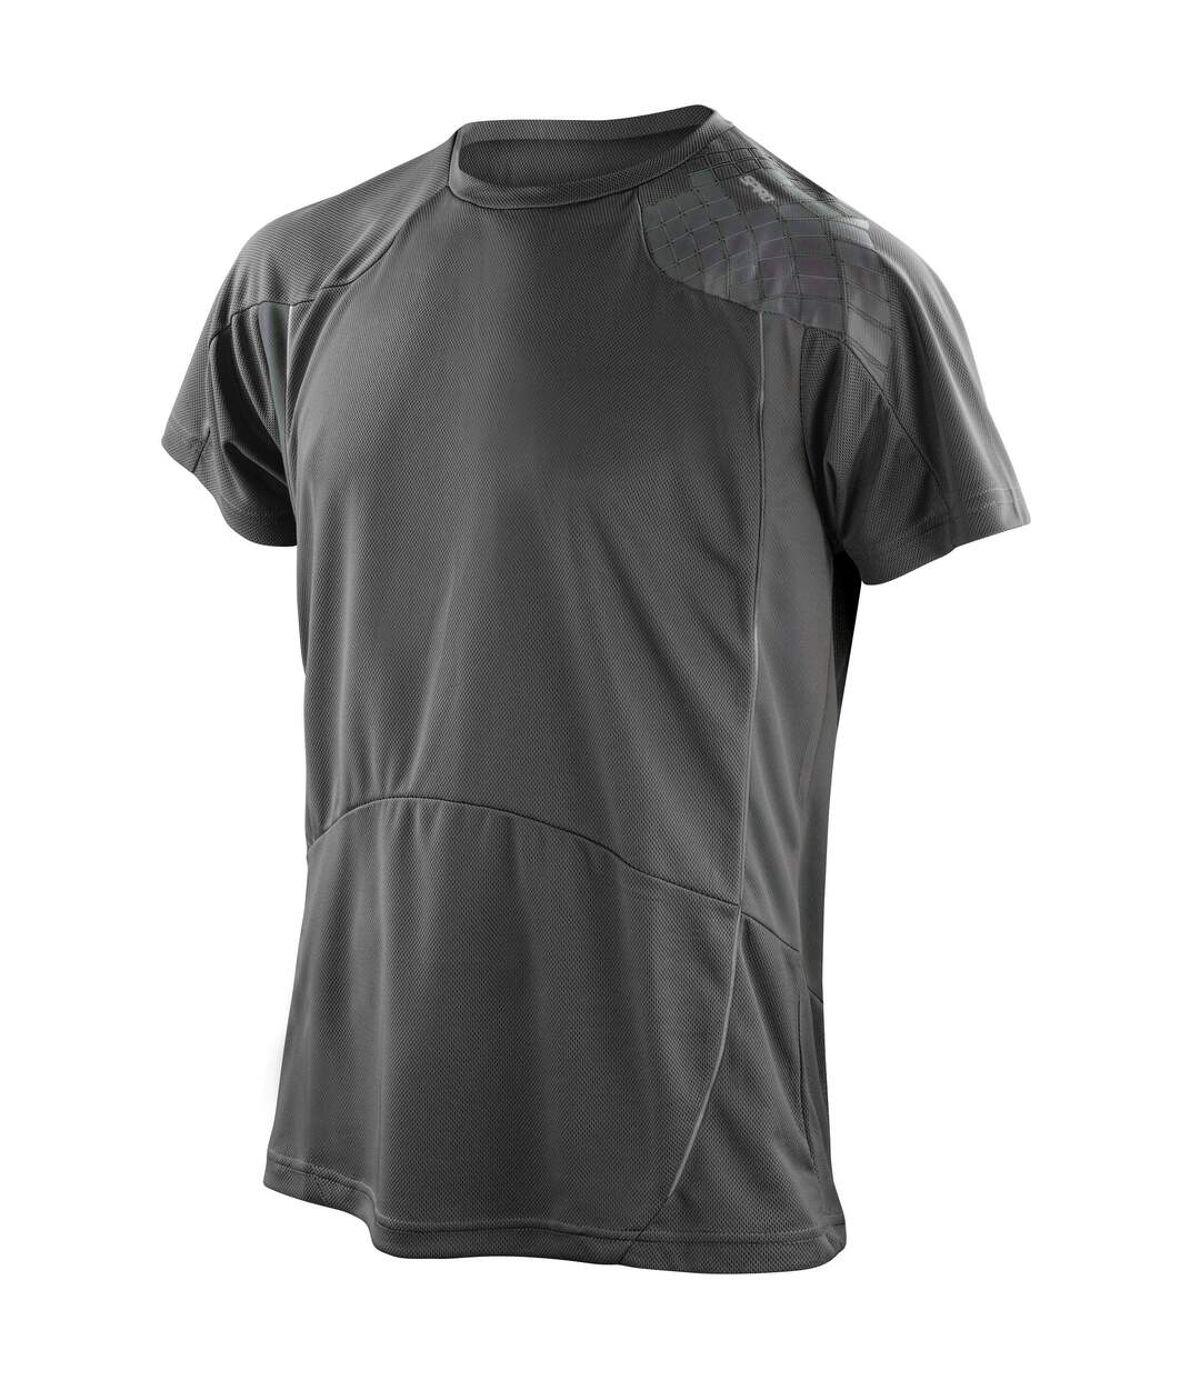 Spiro Mens Performance Sports Lightweight Athletic Training T-Shirt (Black/Red) - UTRW1468